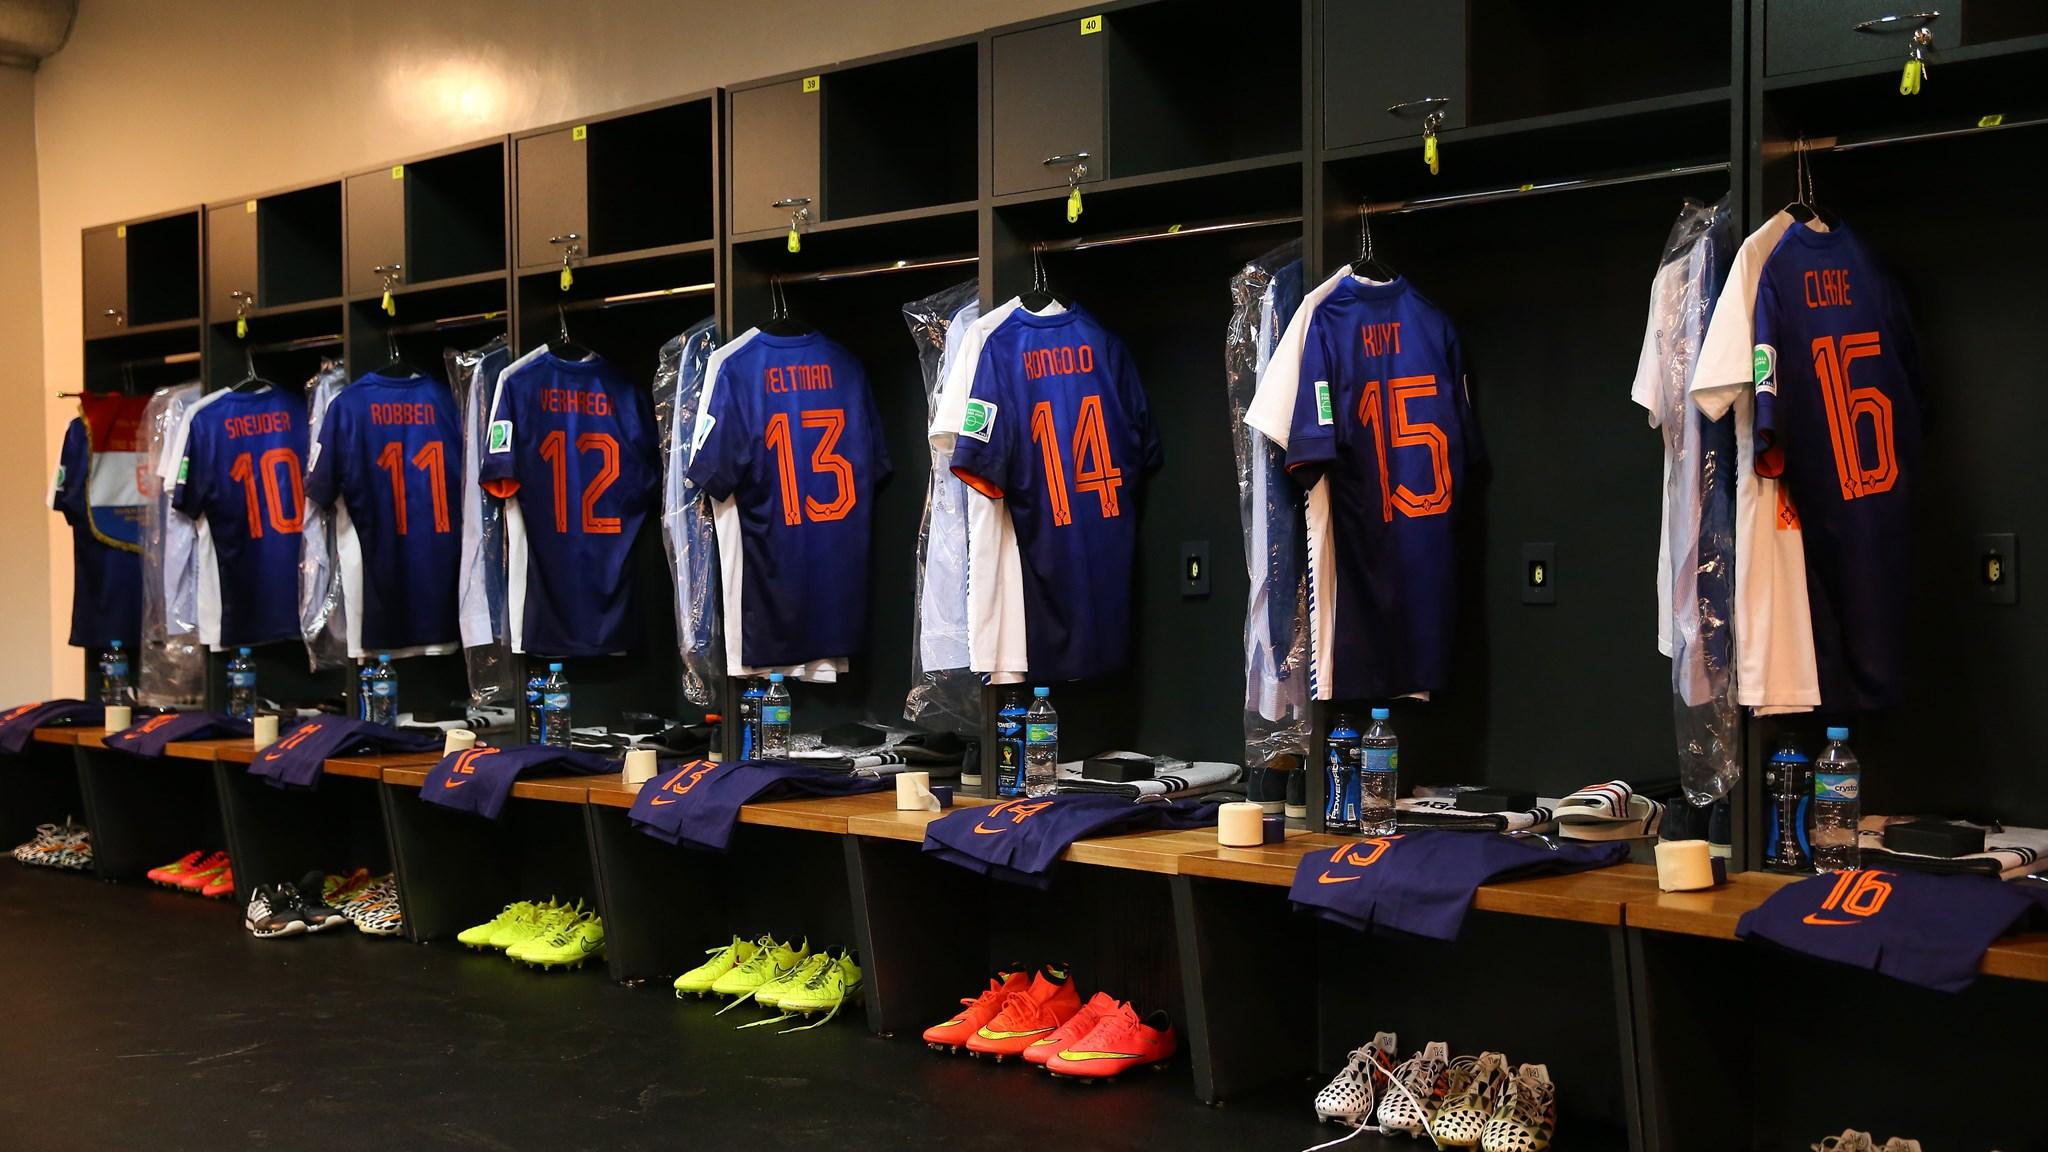 202 - Brazil-Netherlands [0-3] -- 12 Jul 2014 - 17-00 - kuaza